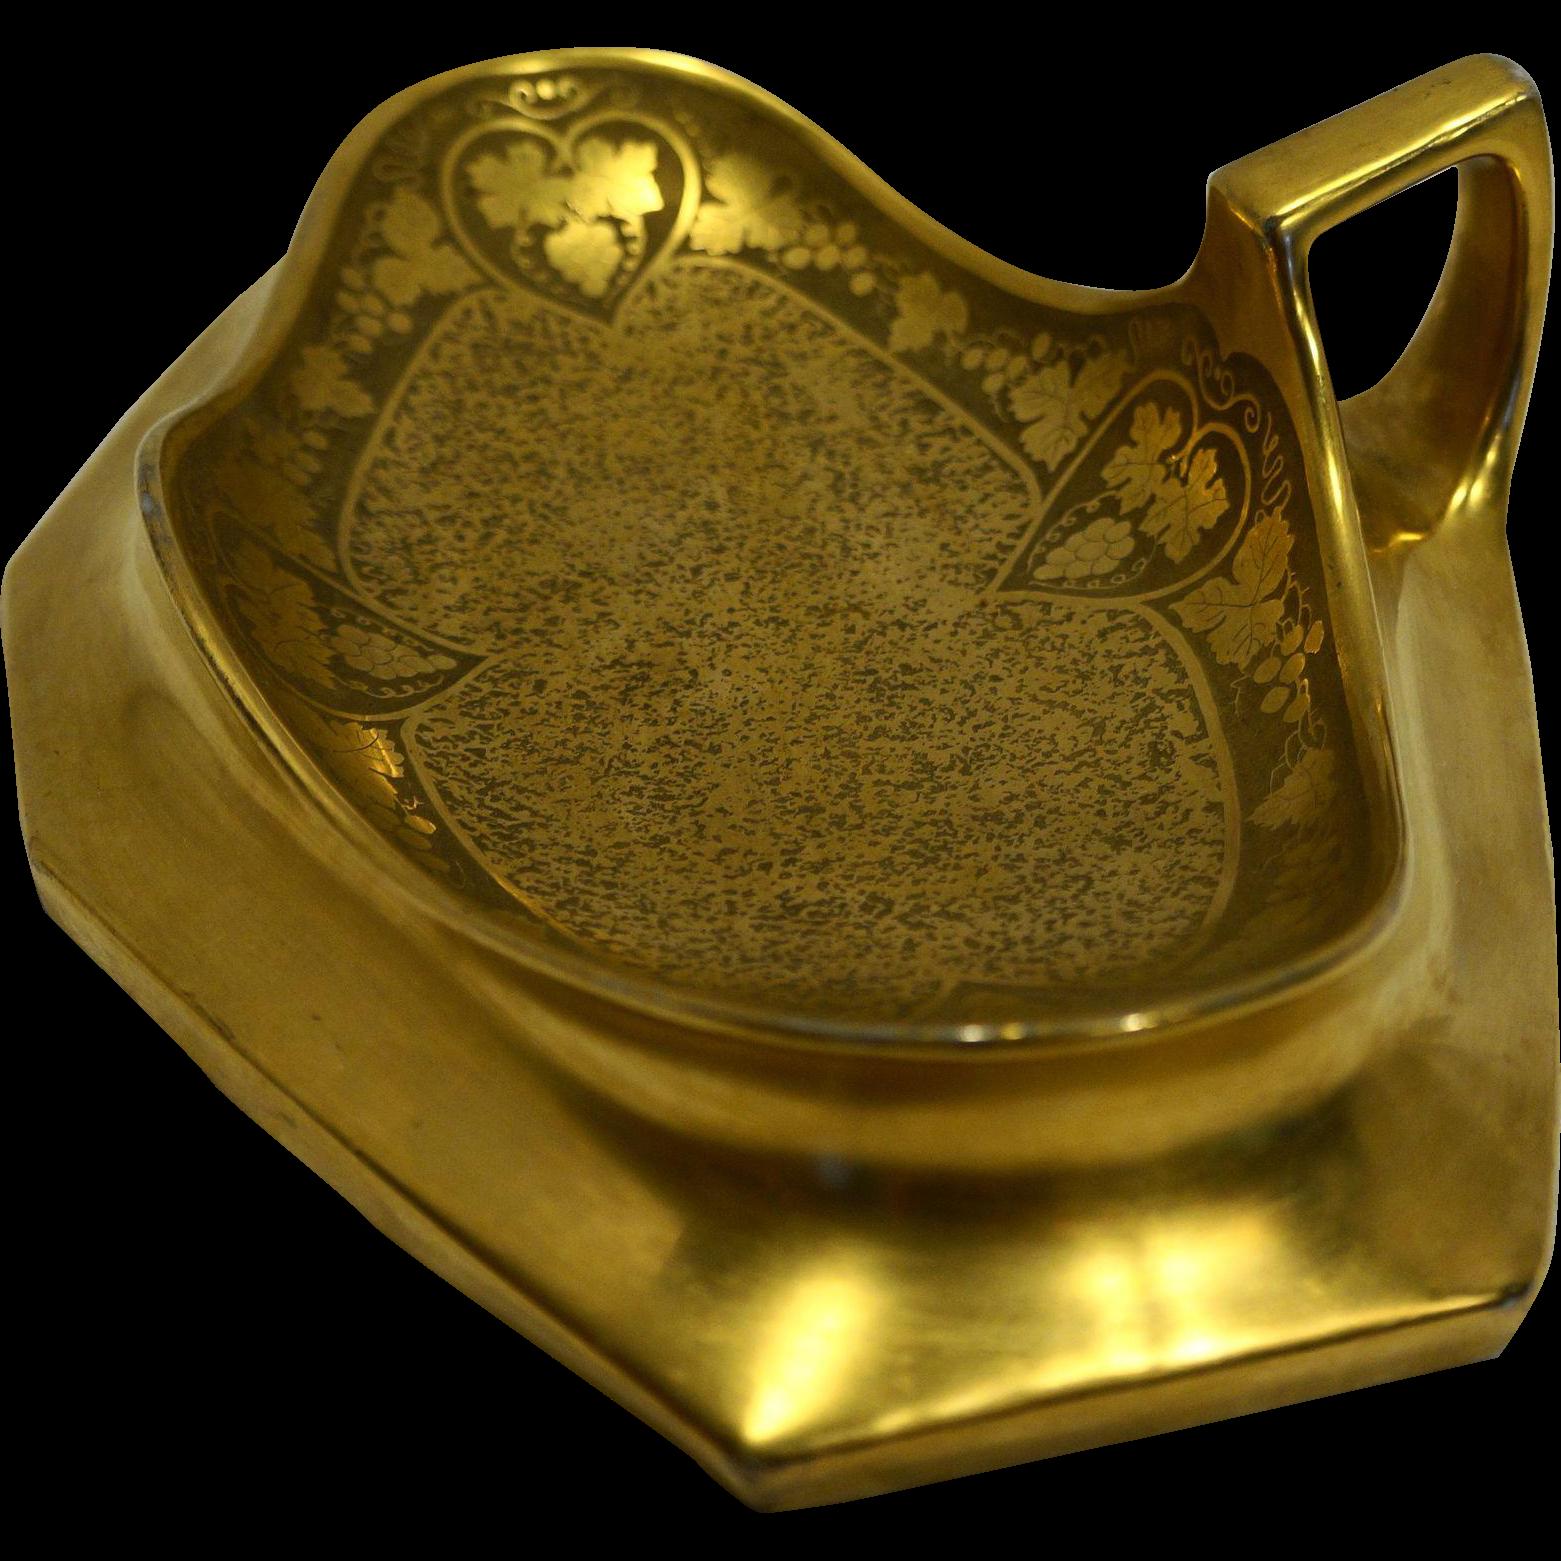 Osborne Art Studios Hand Wrought Gold Bon Bon Dish Porcelain